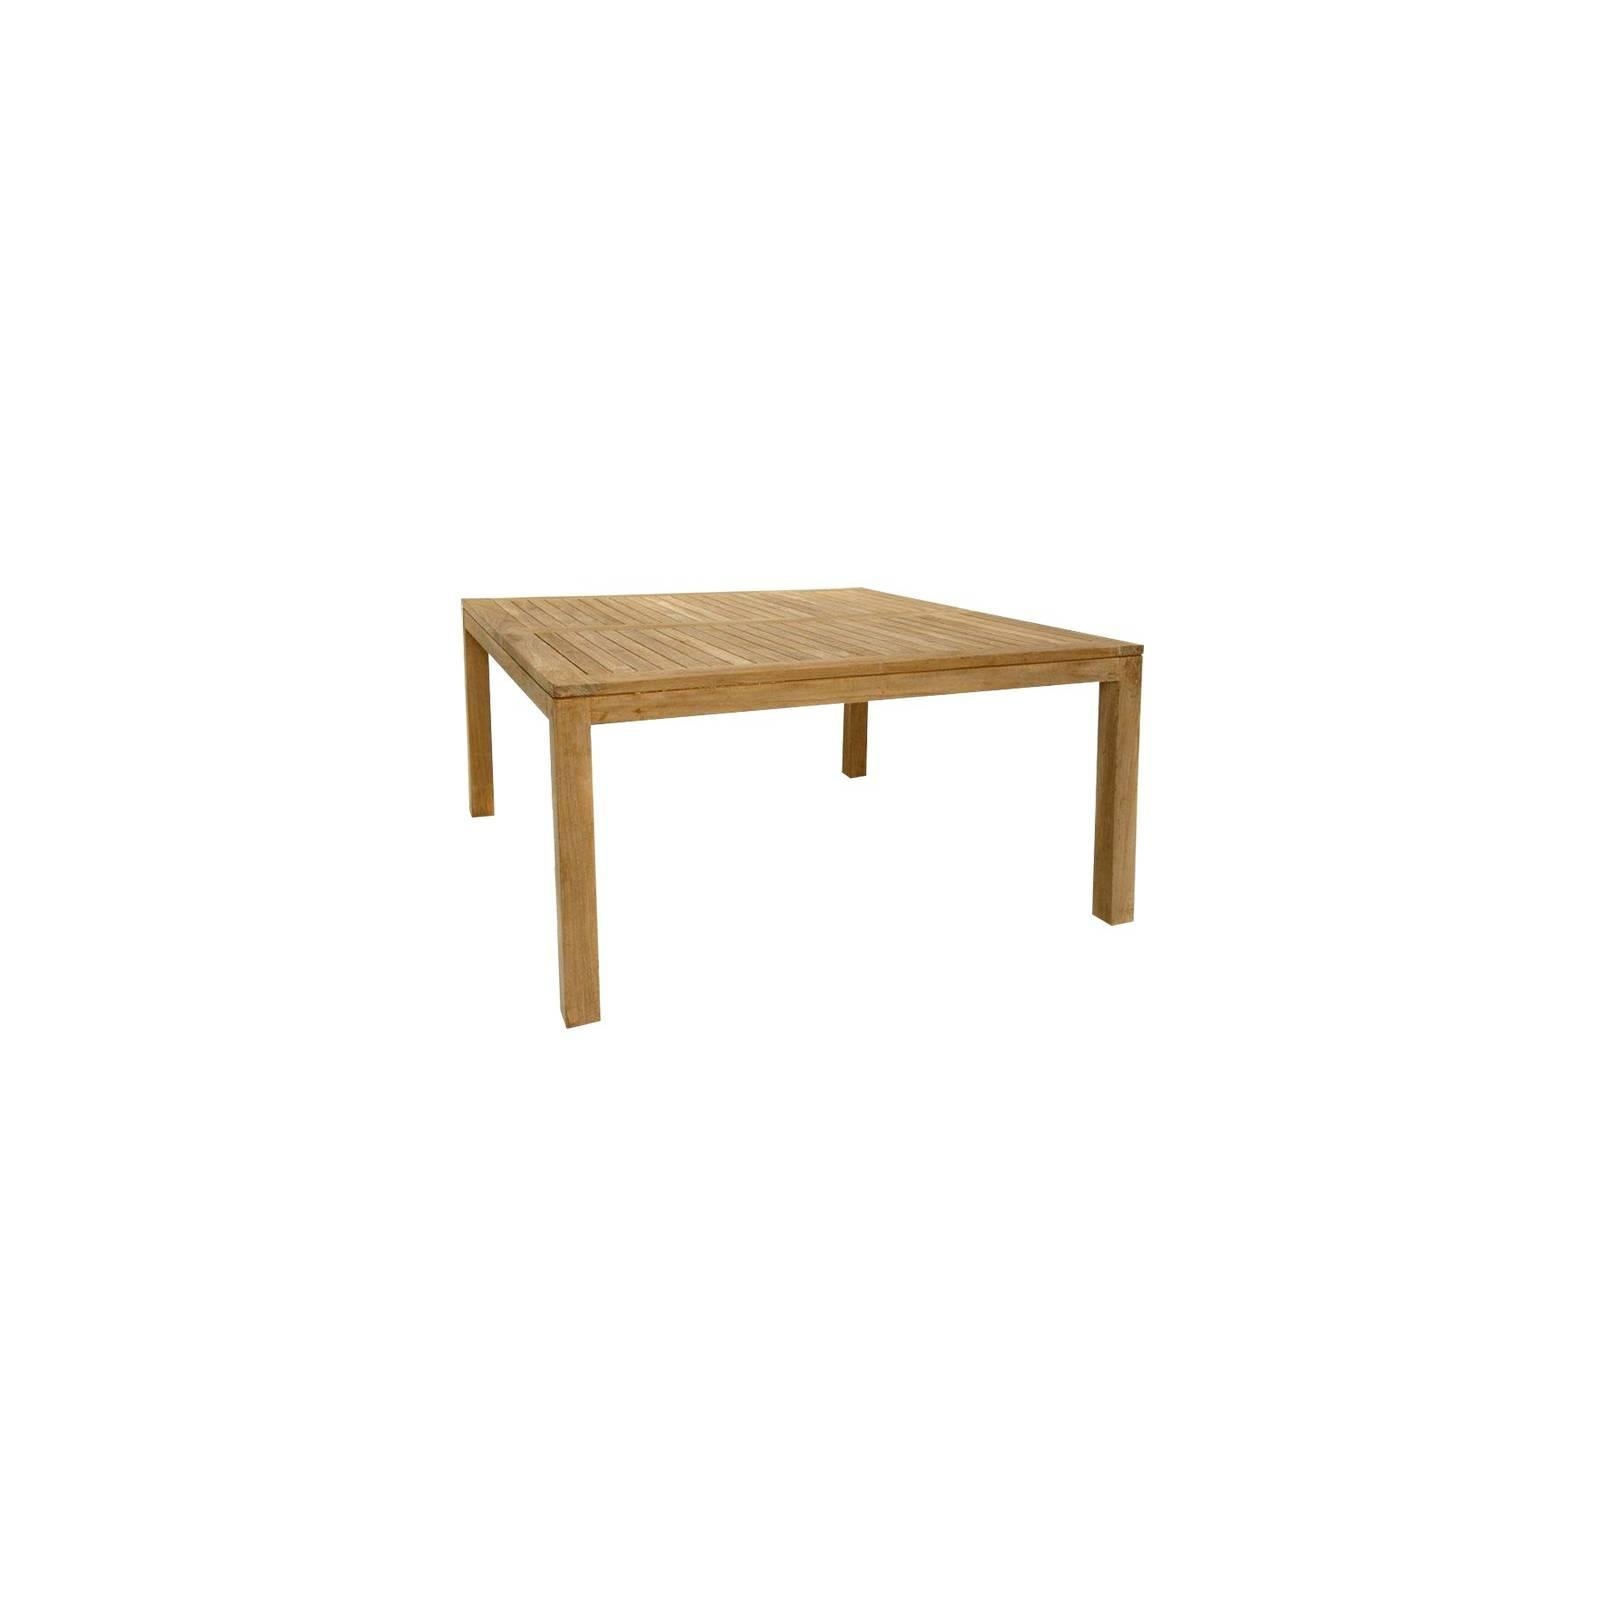 Teck Taman Repas De Table Carrée nv80wNm